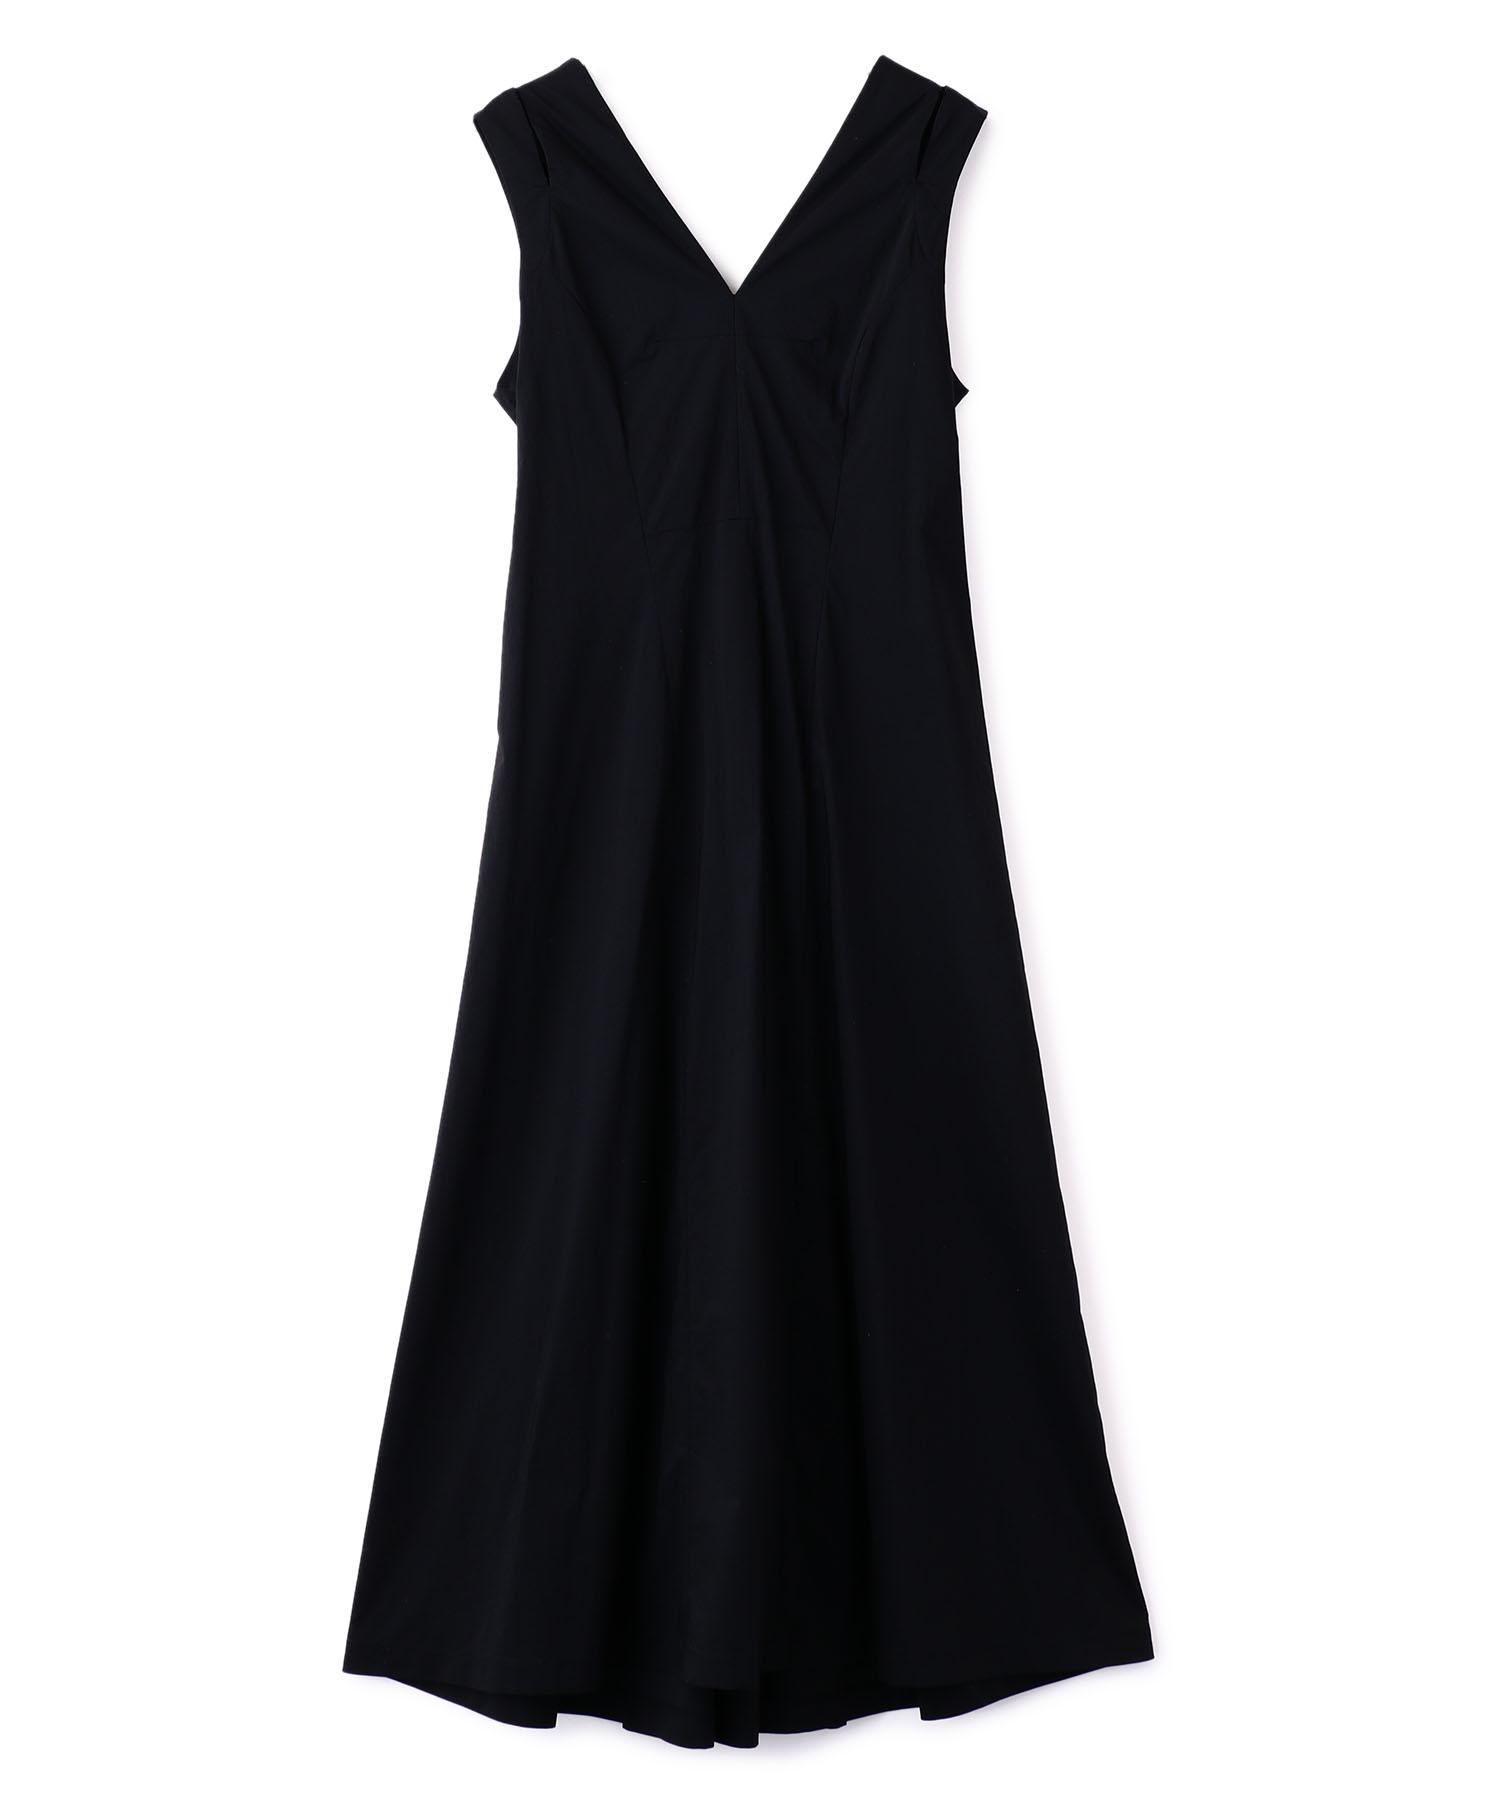 Taffeta Flare Dress